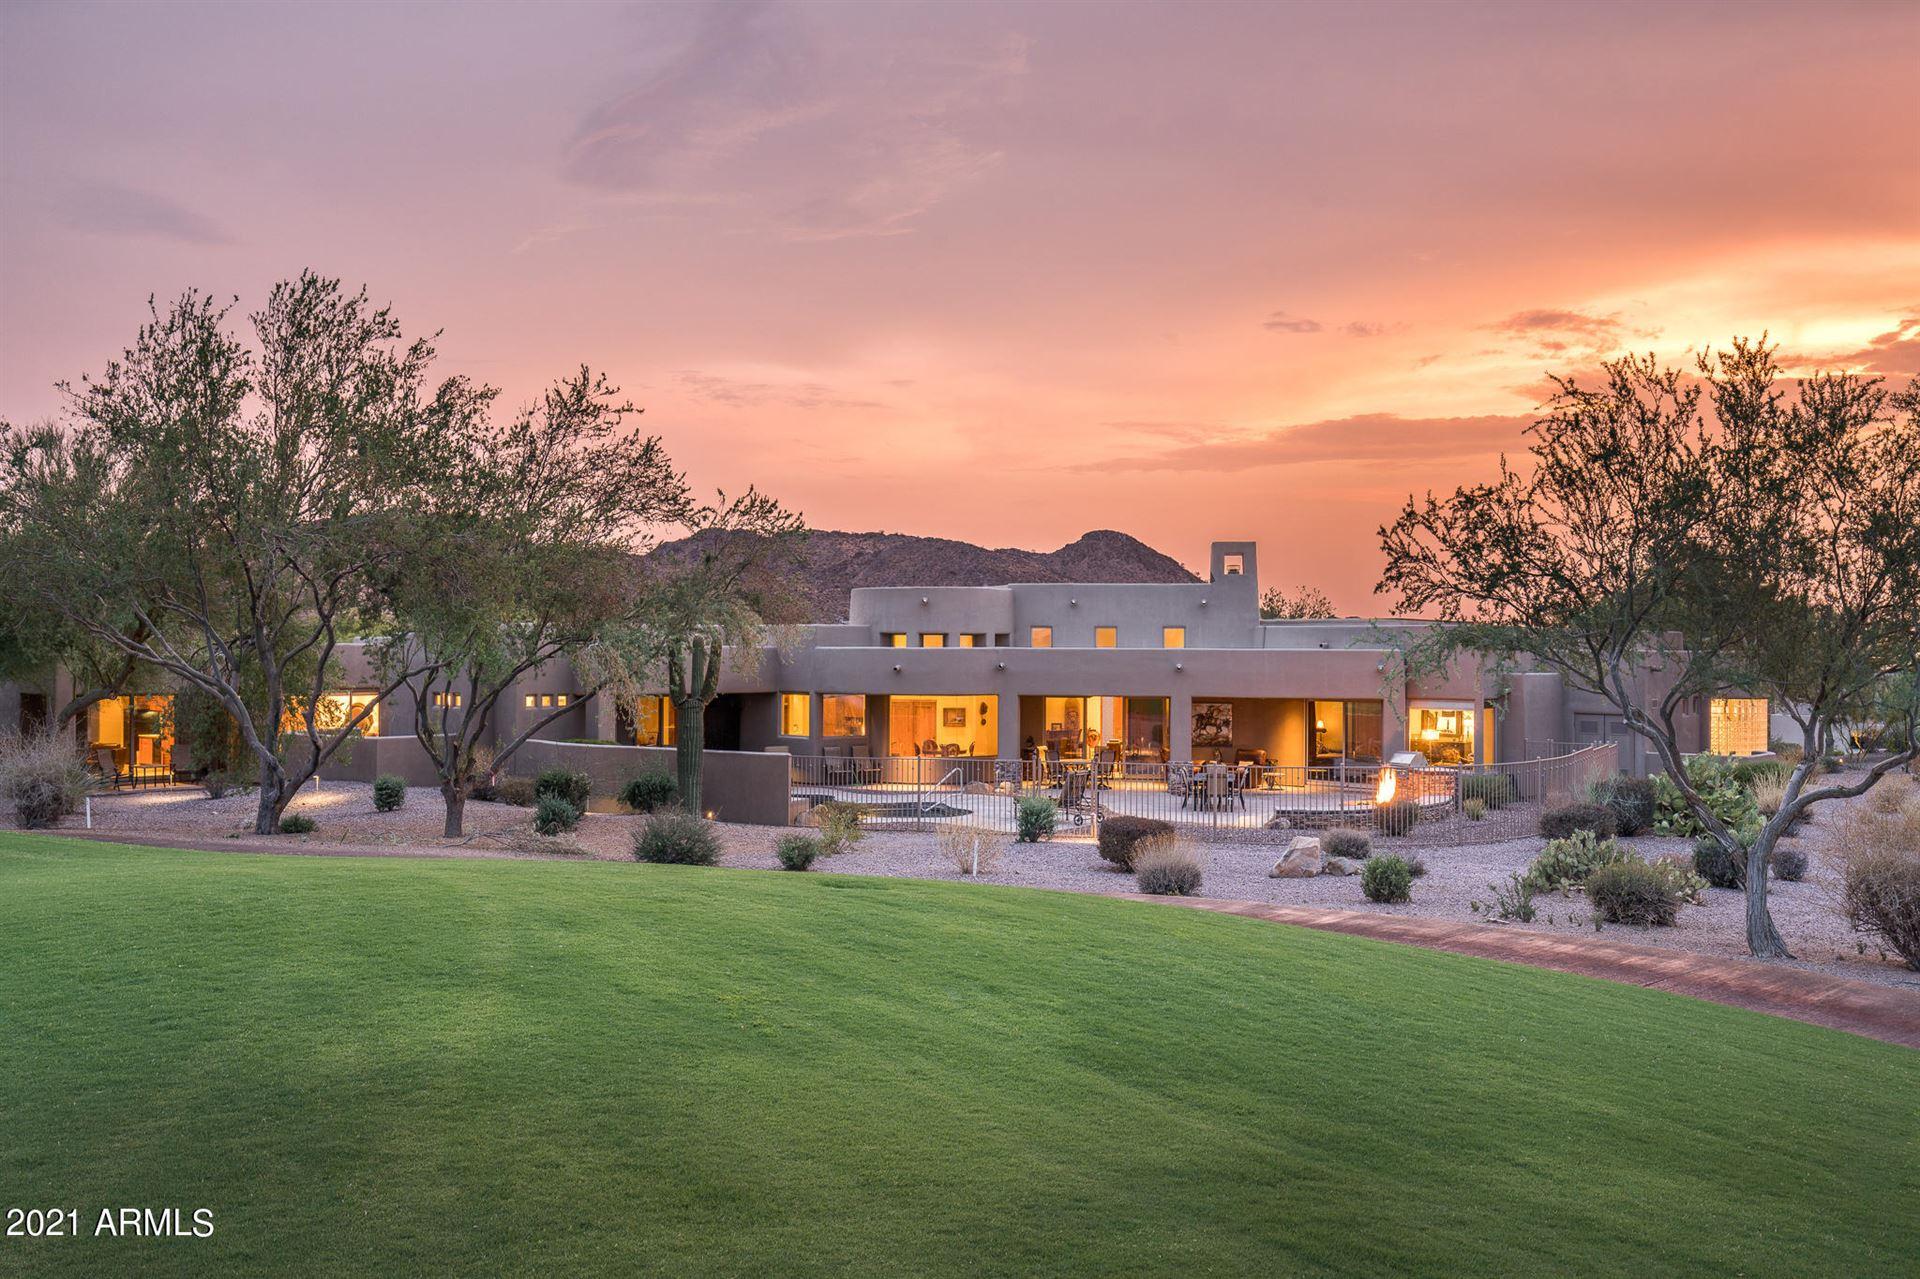 6911 E GRAY FOX Court, Gold Canyon, AZ 85118 - MLS#: 6262007